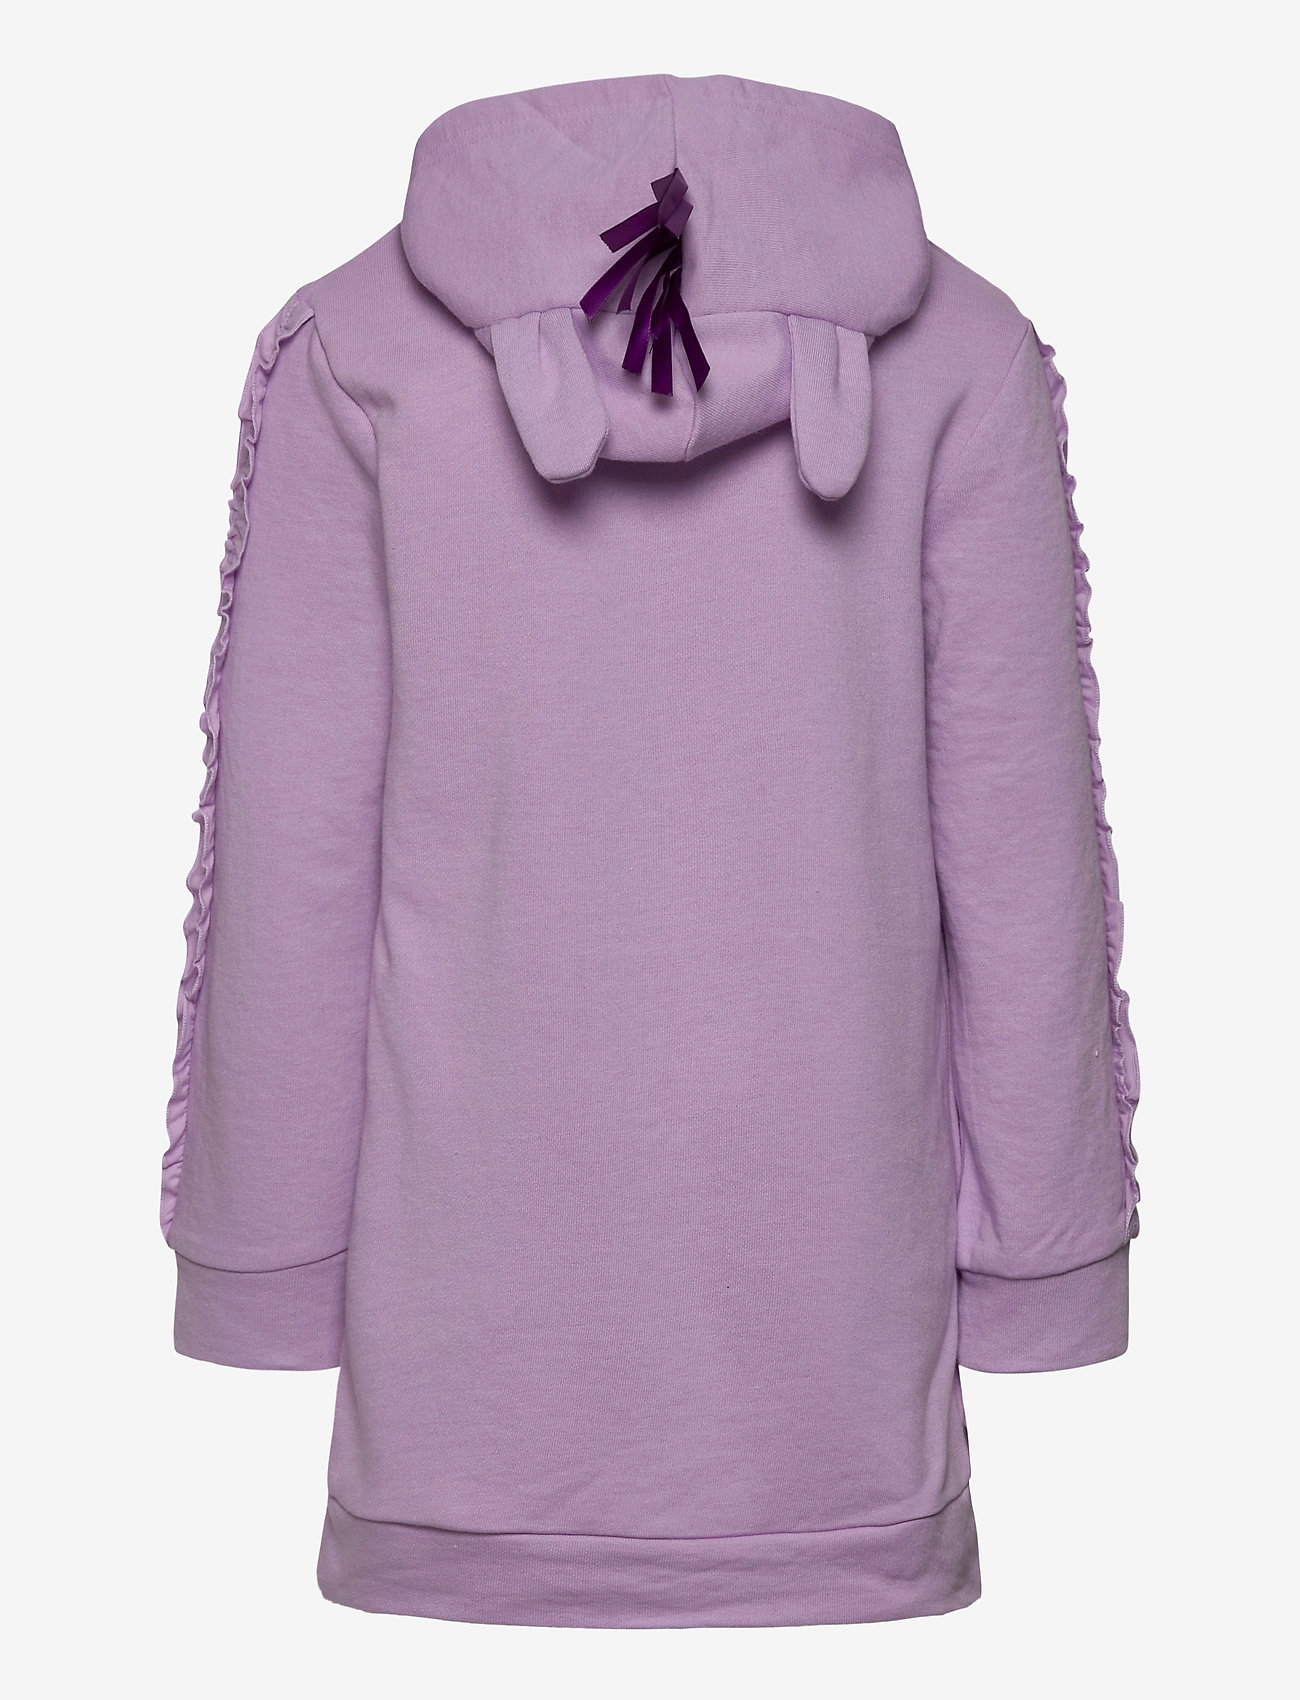 My Little Pony - DRESS WITH LONG SLEEVES - kapuzenpullover - purple - 1